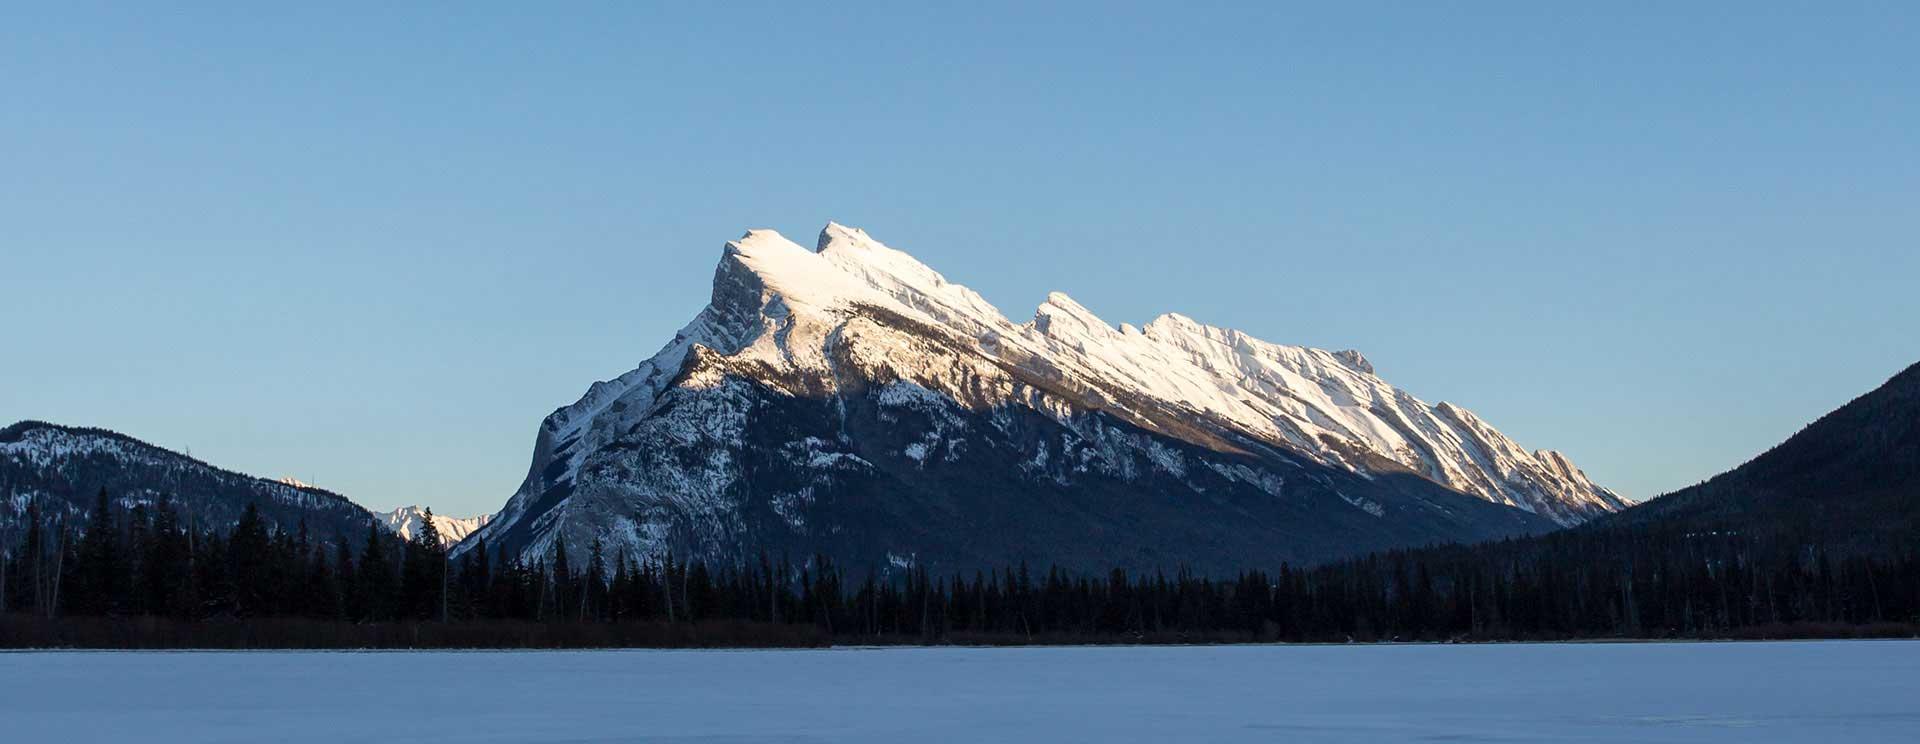 Mt. Rundle in Banff, Banff National Park.